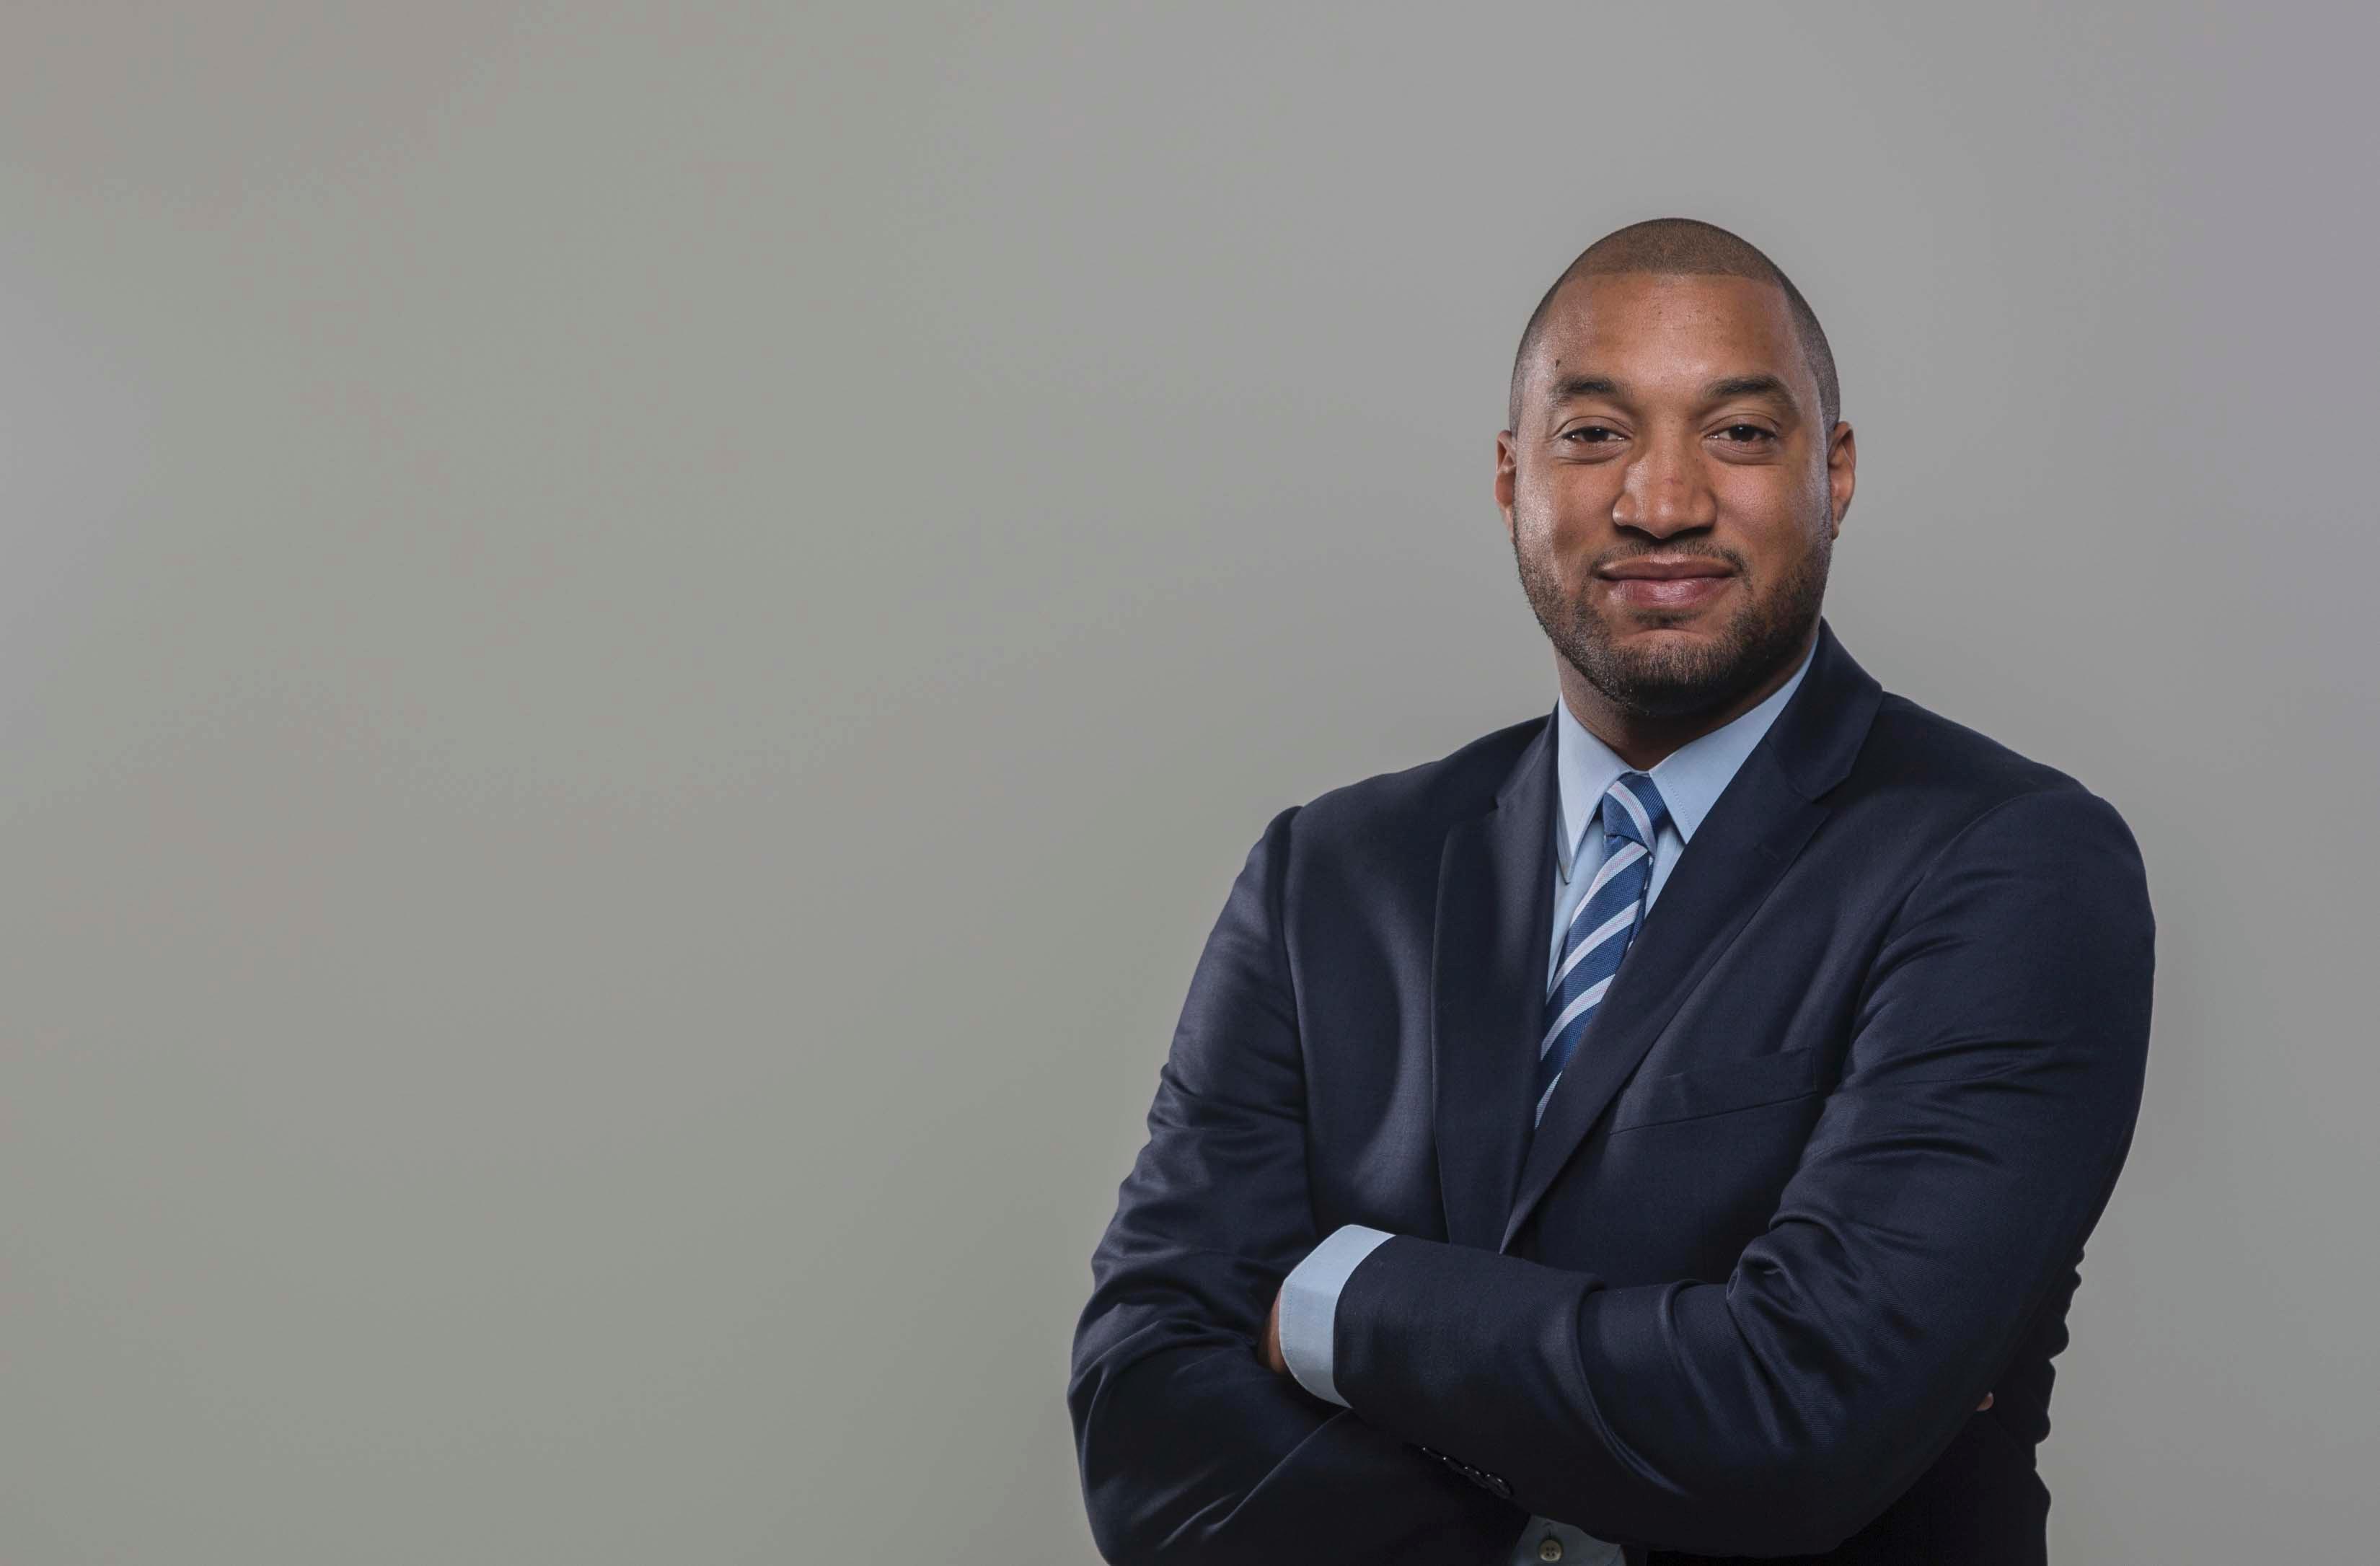 TORREY GLENN FORD Financial Professional & Insurance Agent